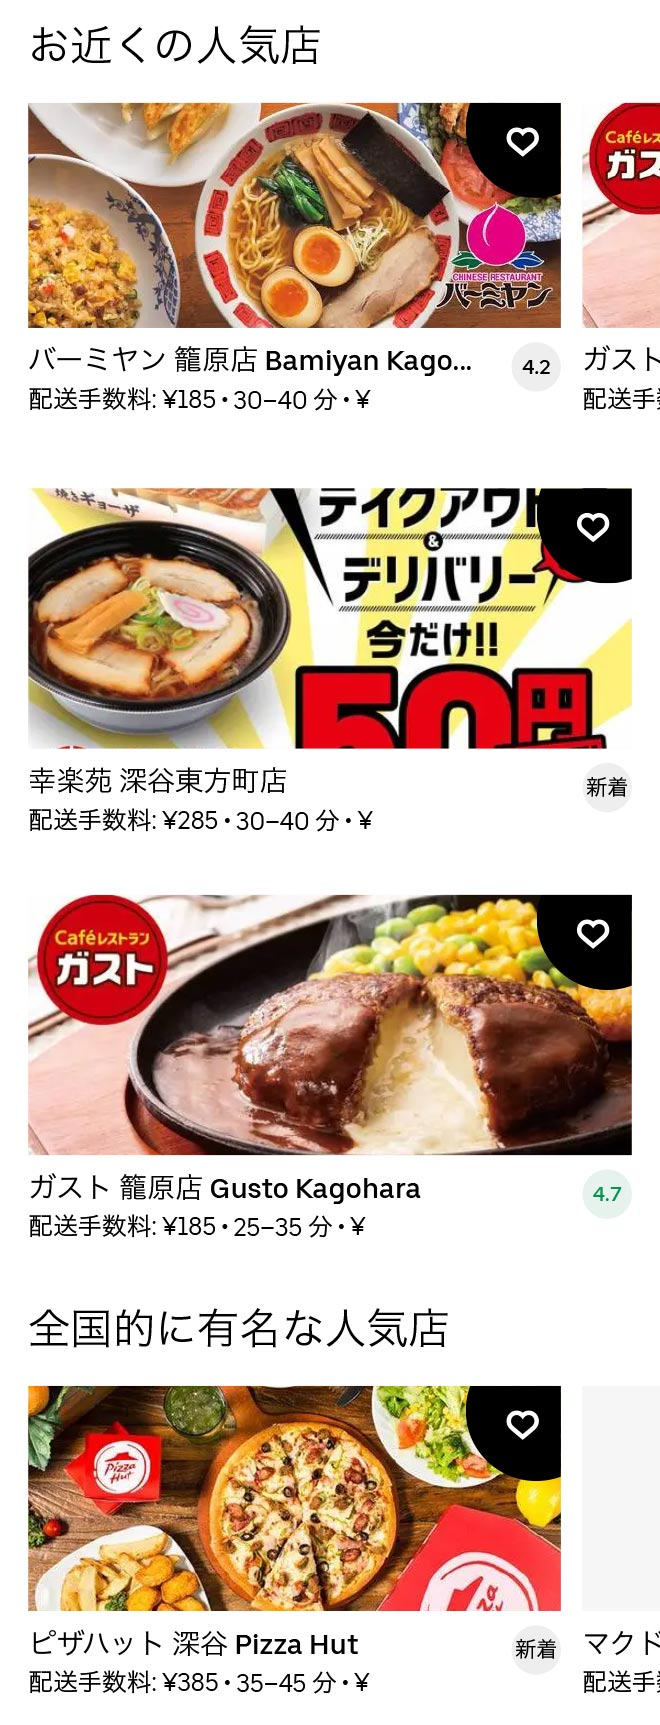 Kagohara menu 2101 01